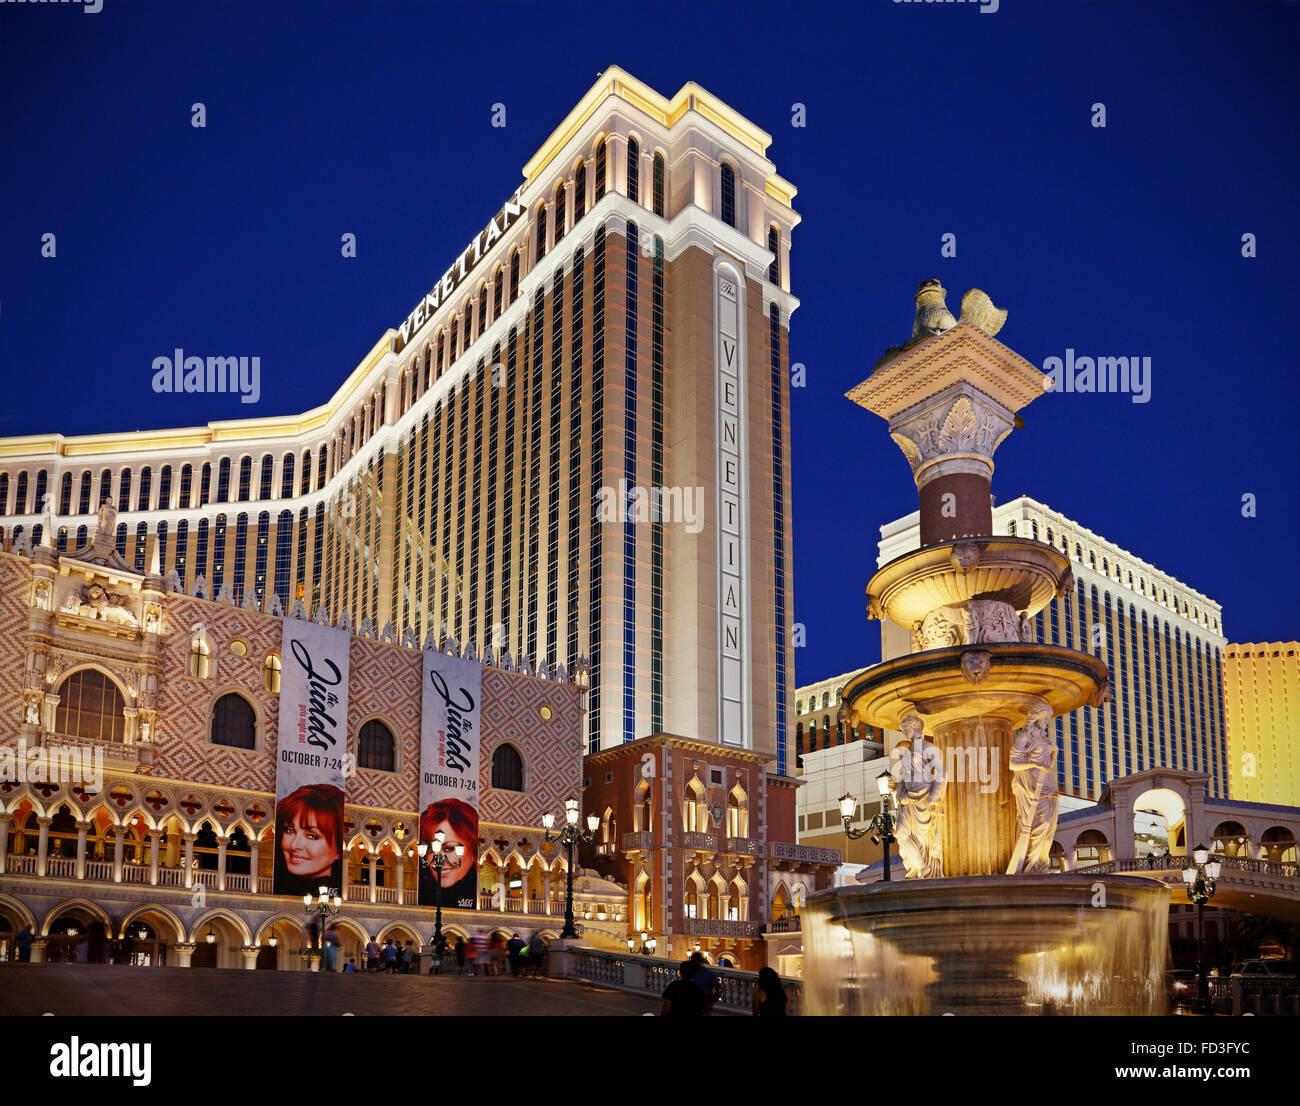 The venetian las vegas hotel deals - Stock Photo The Venetian Hotel In Las Vegas Nevada At Night